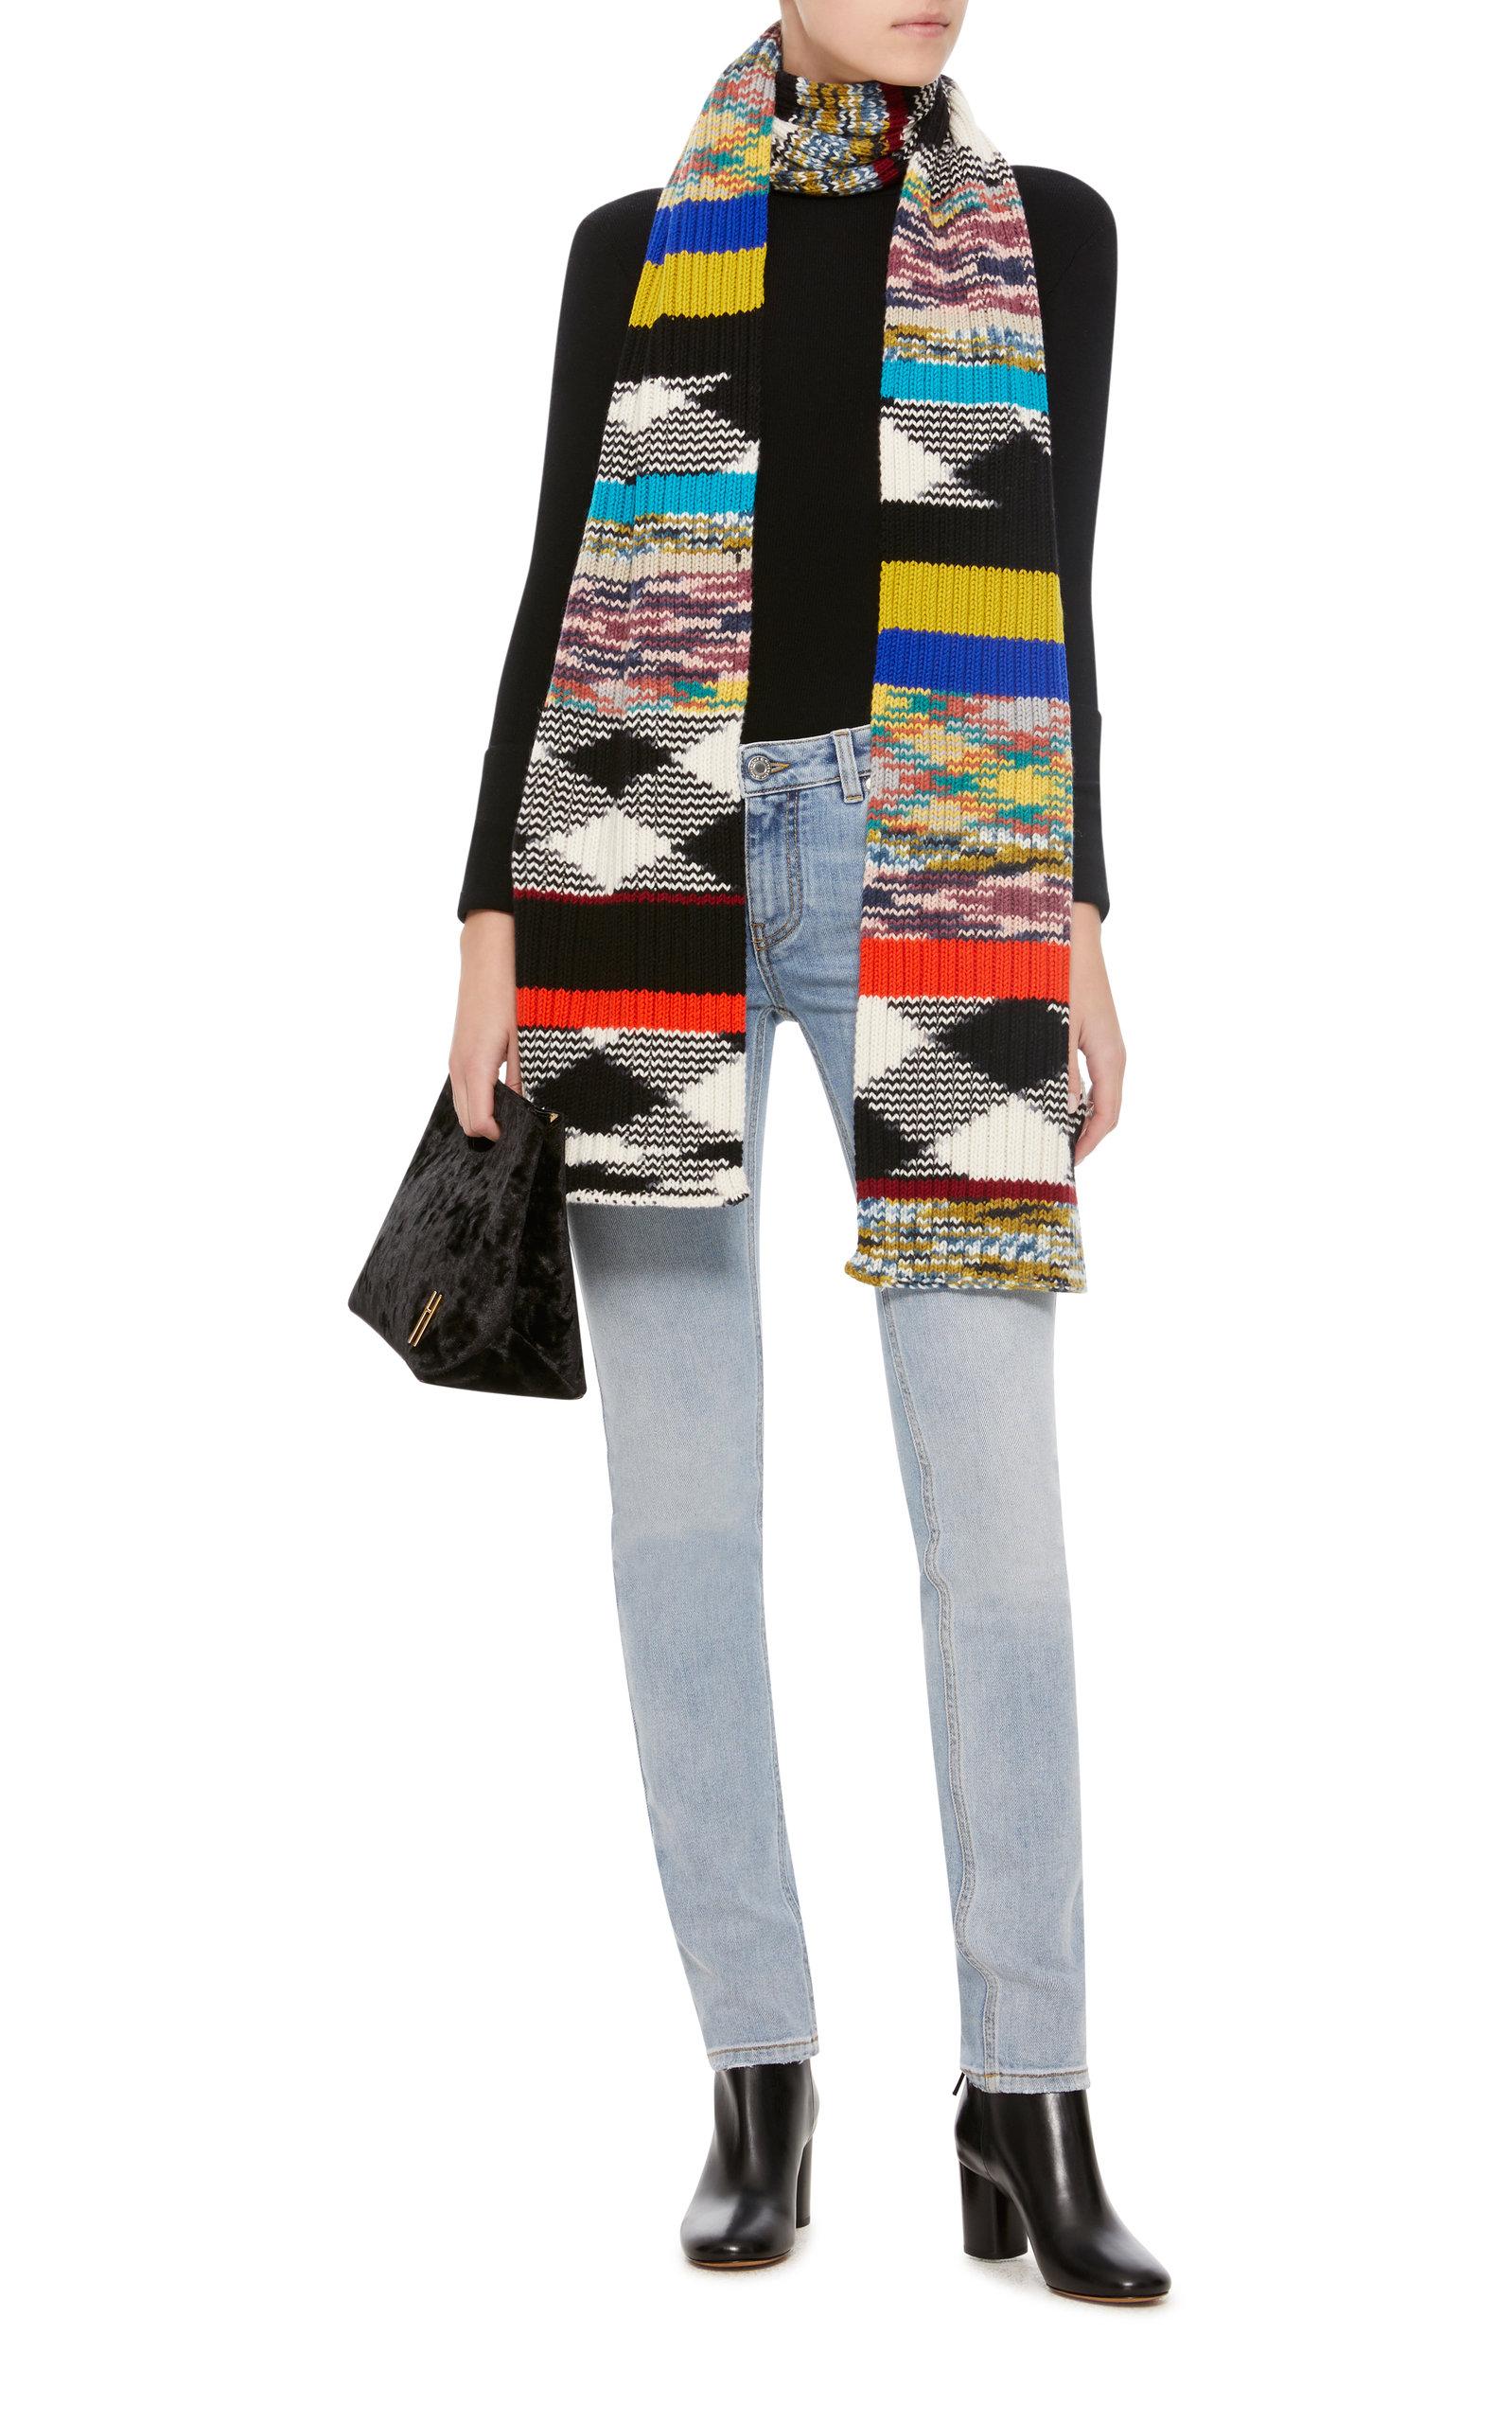 Fringed Crochet-Knit Cashmere Scarf Missoni MjQkDGFt4L